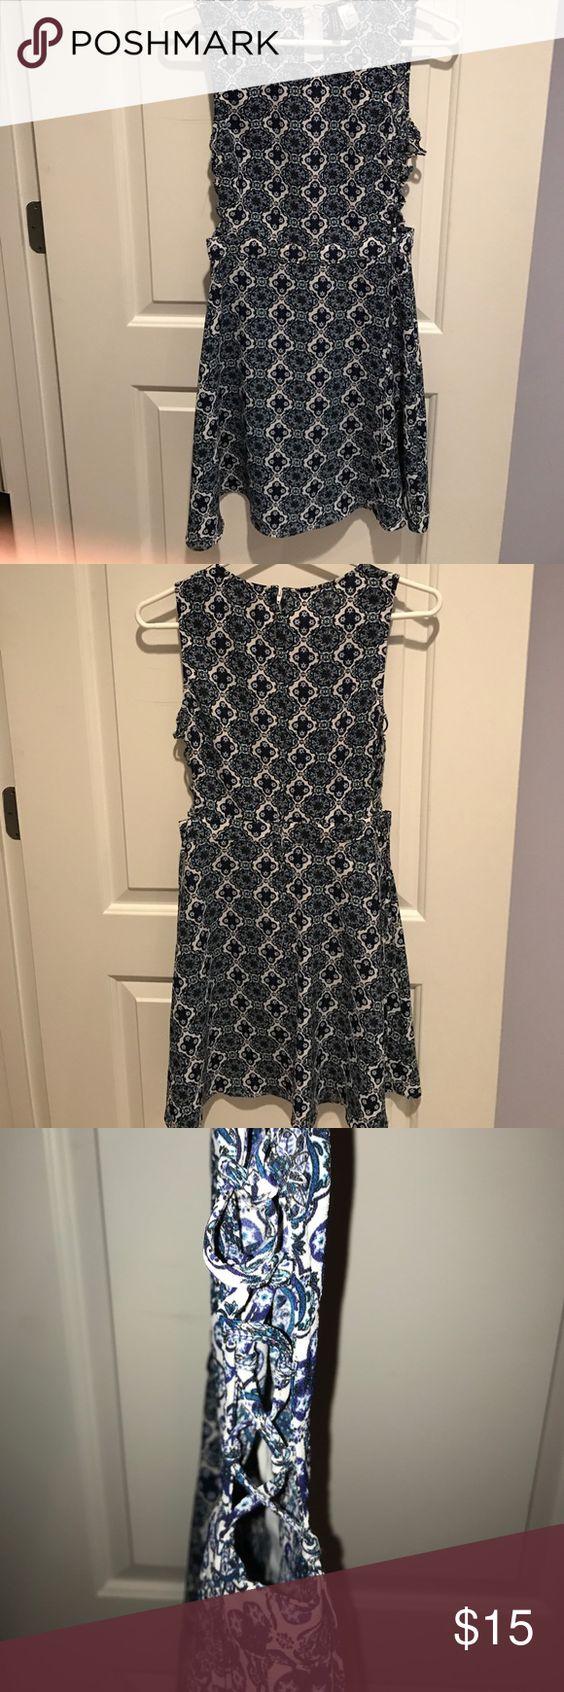 H&m blue lace dress  HuM Cutout Dress Size   H m dress Urban outfitters and Lace